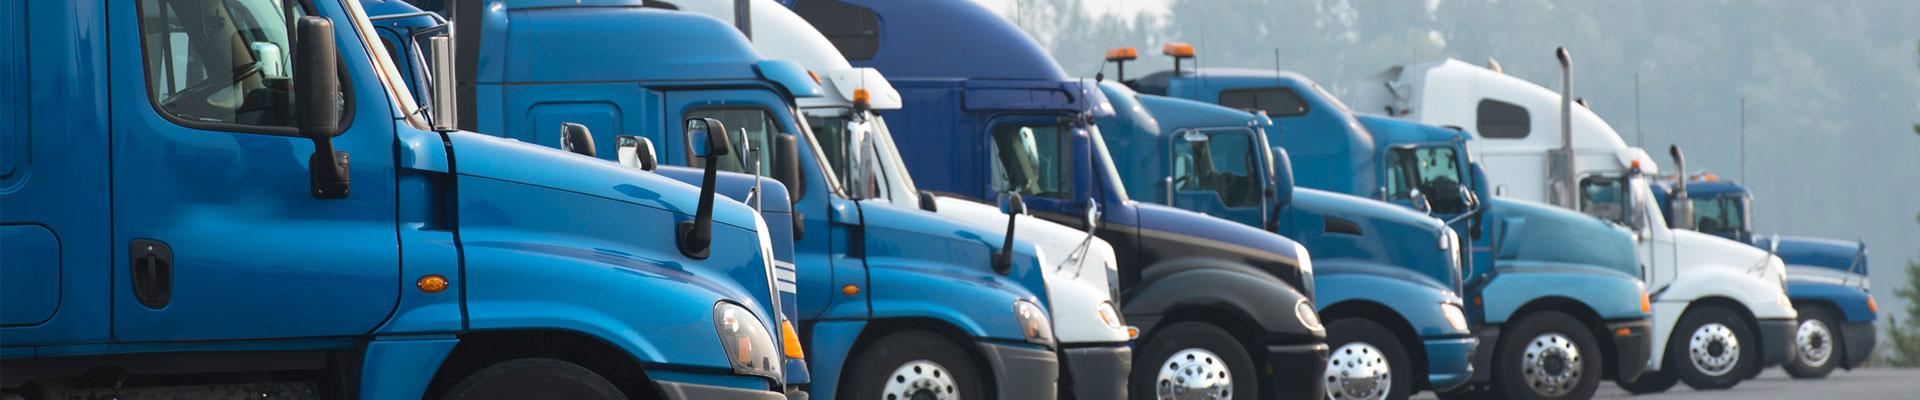 Transportation & Logistics Law